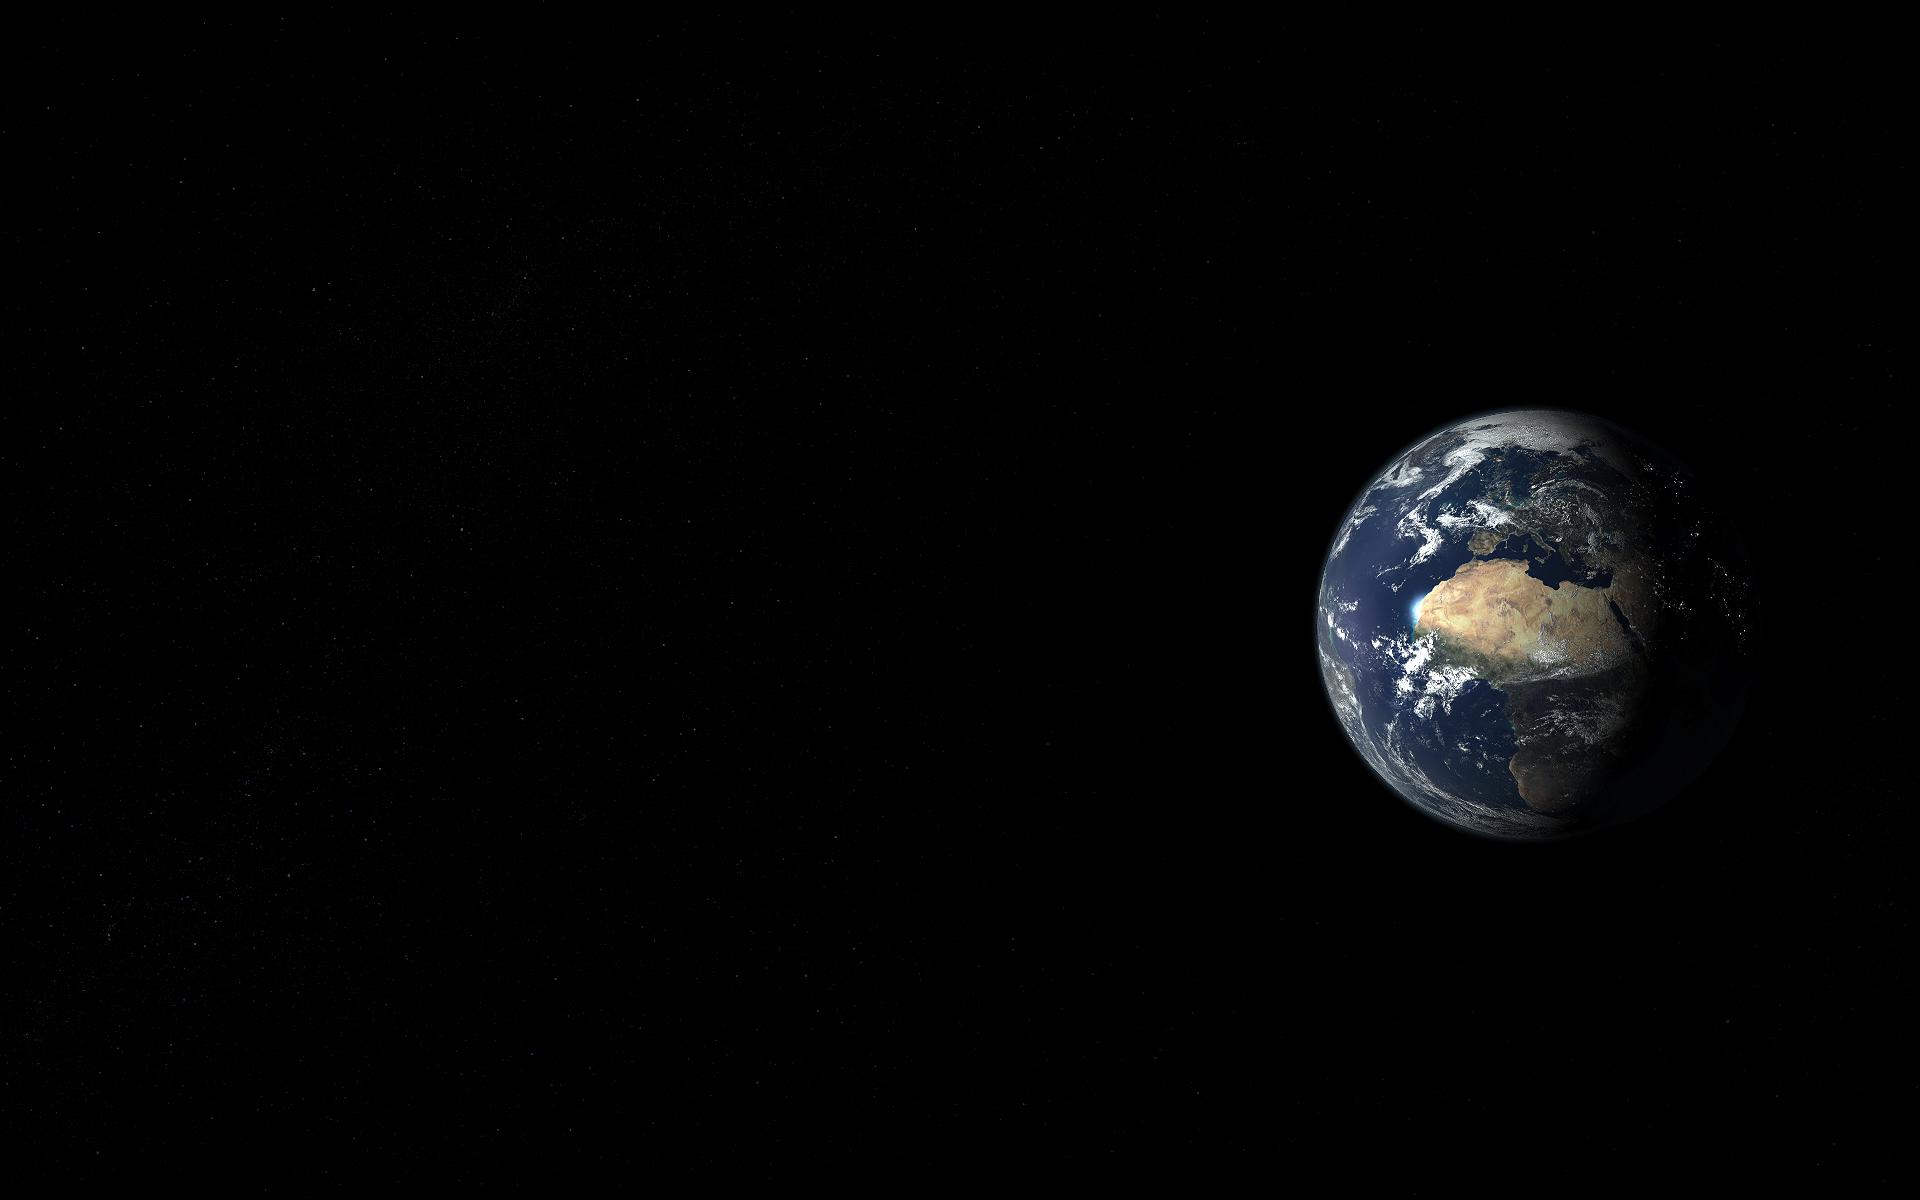 earth from space wallpaper widescreen wallpapersafari